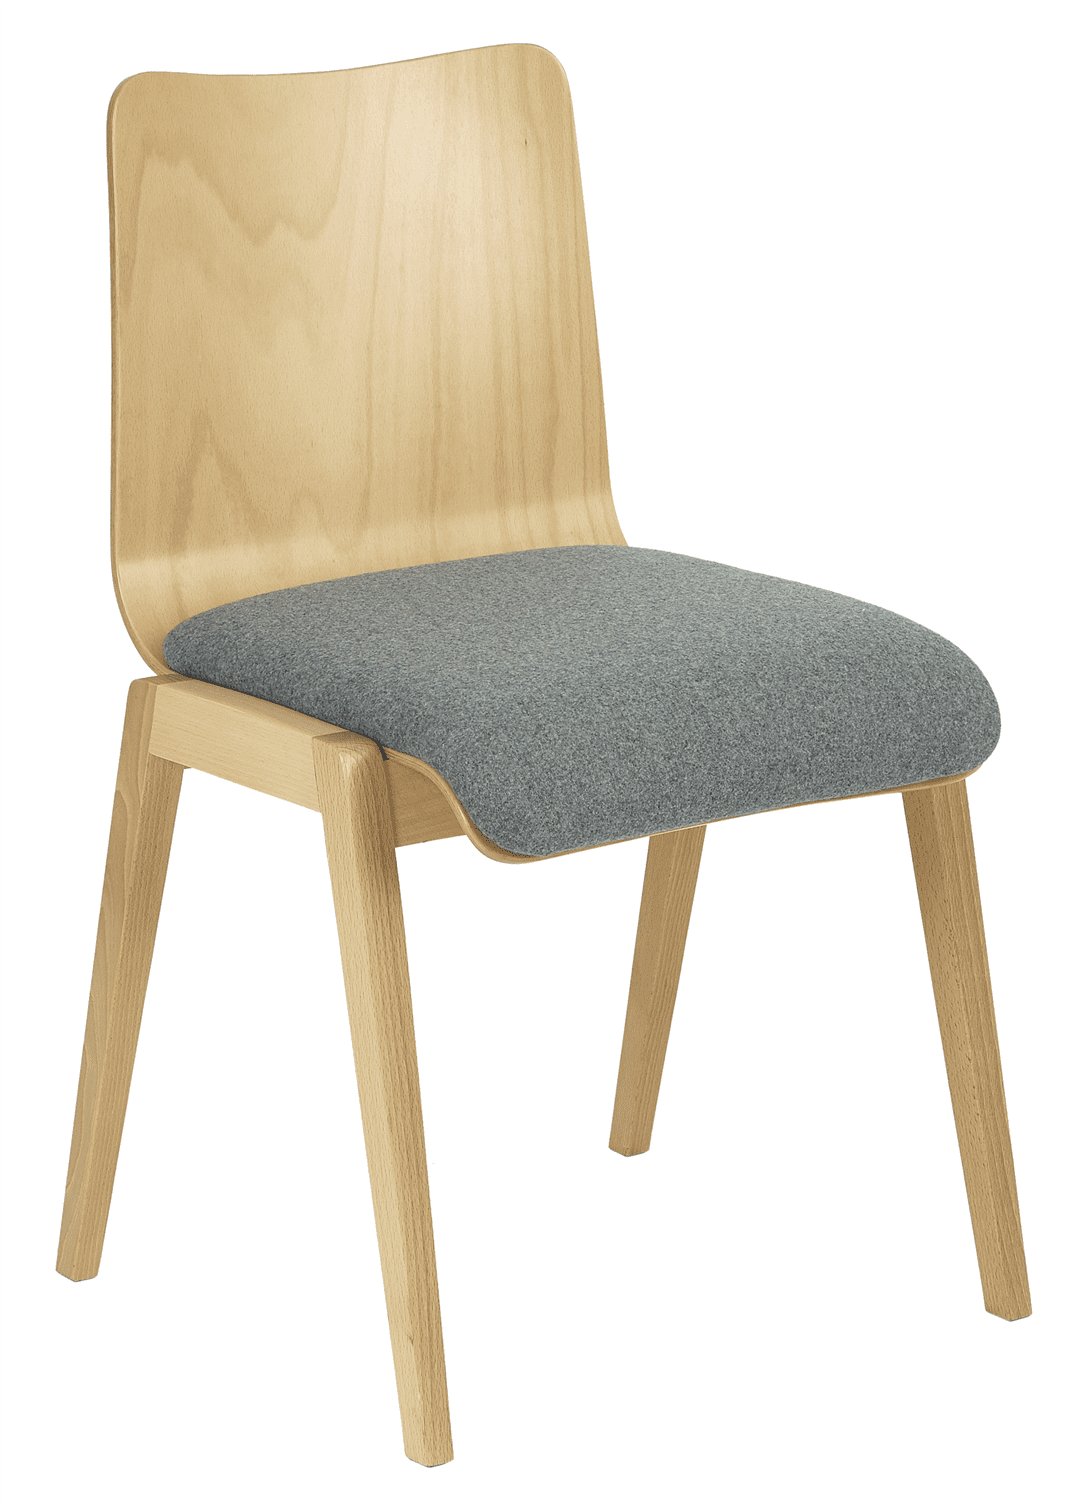 Ladbroke stacking side chair veneer shell raw